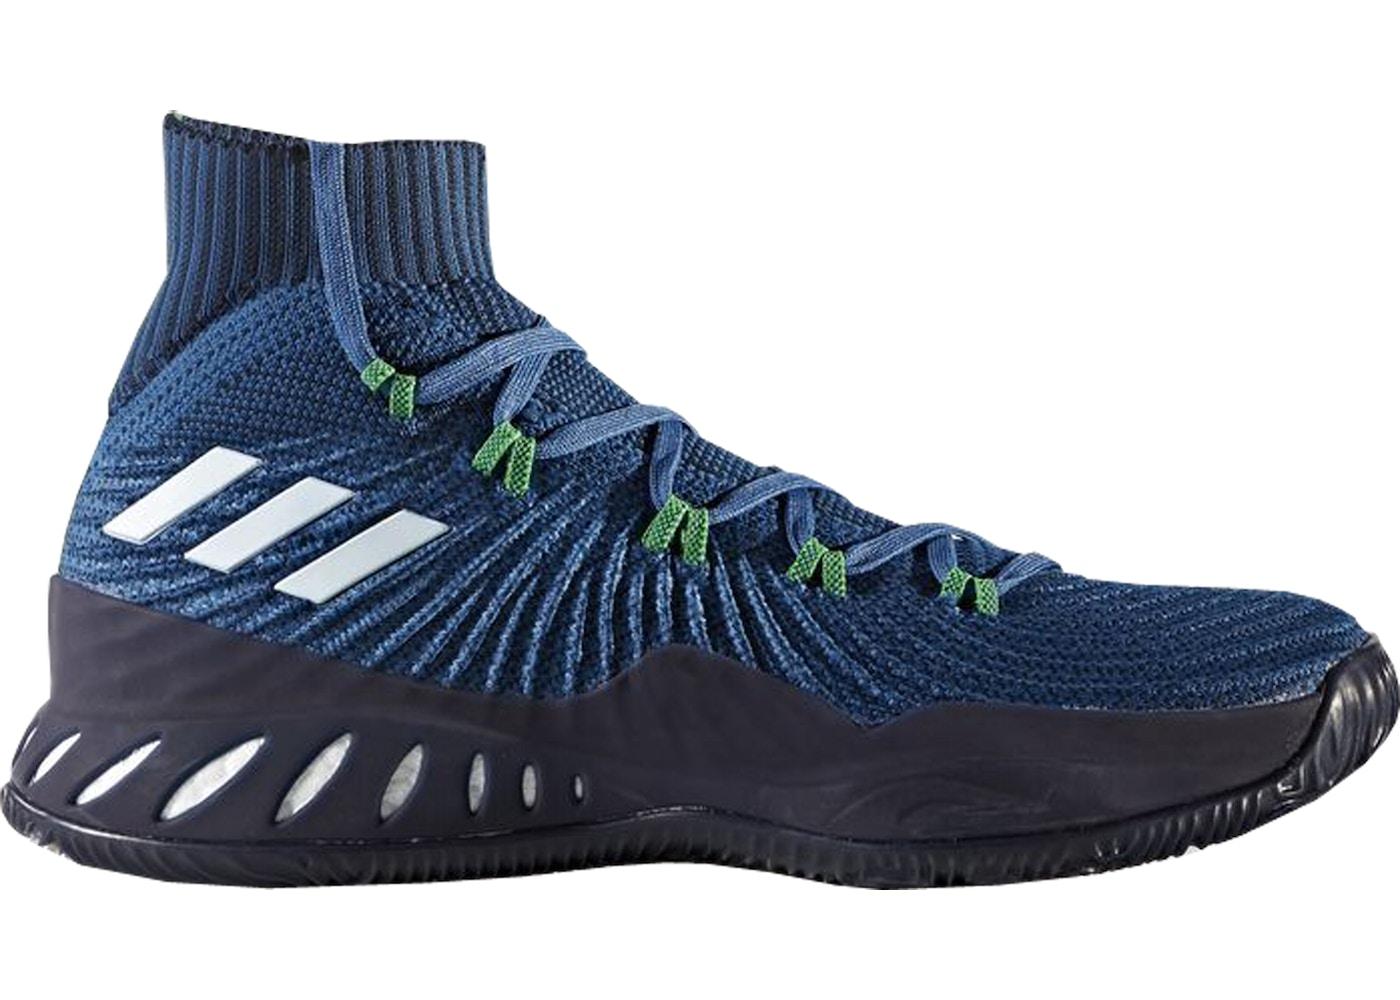 cheap for discount 2fd2e 0dcb8 ... adidas Crazy Explosive 17 Andrew Wiggins PE ...